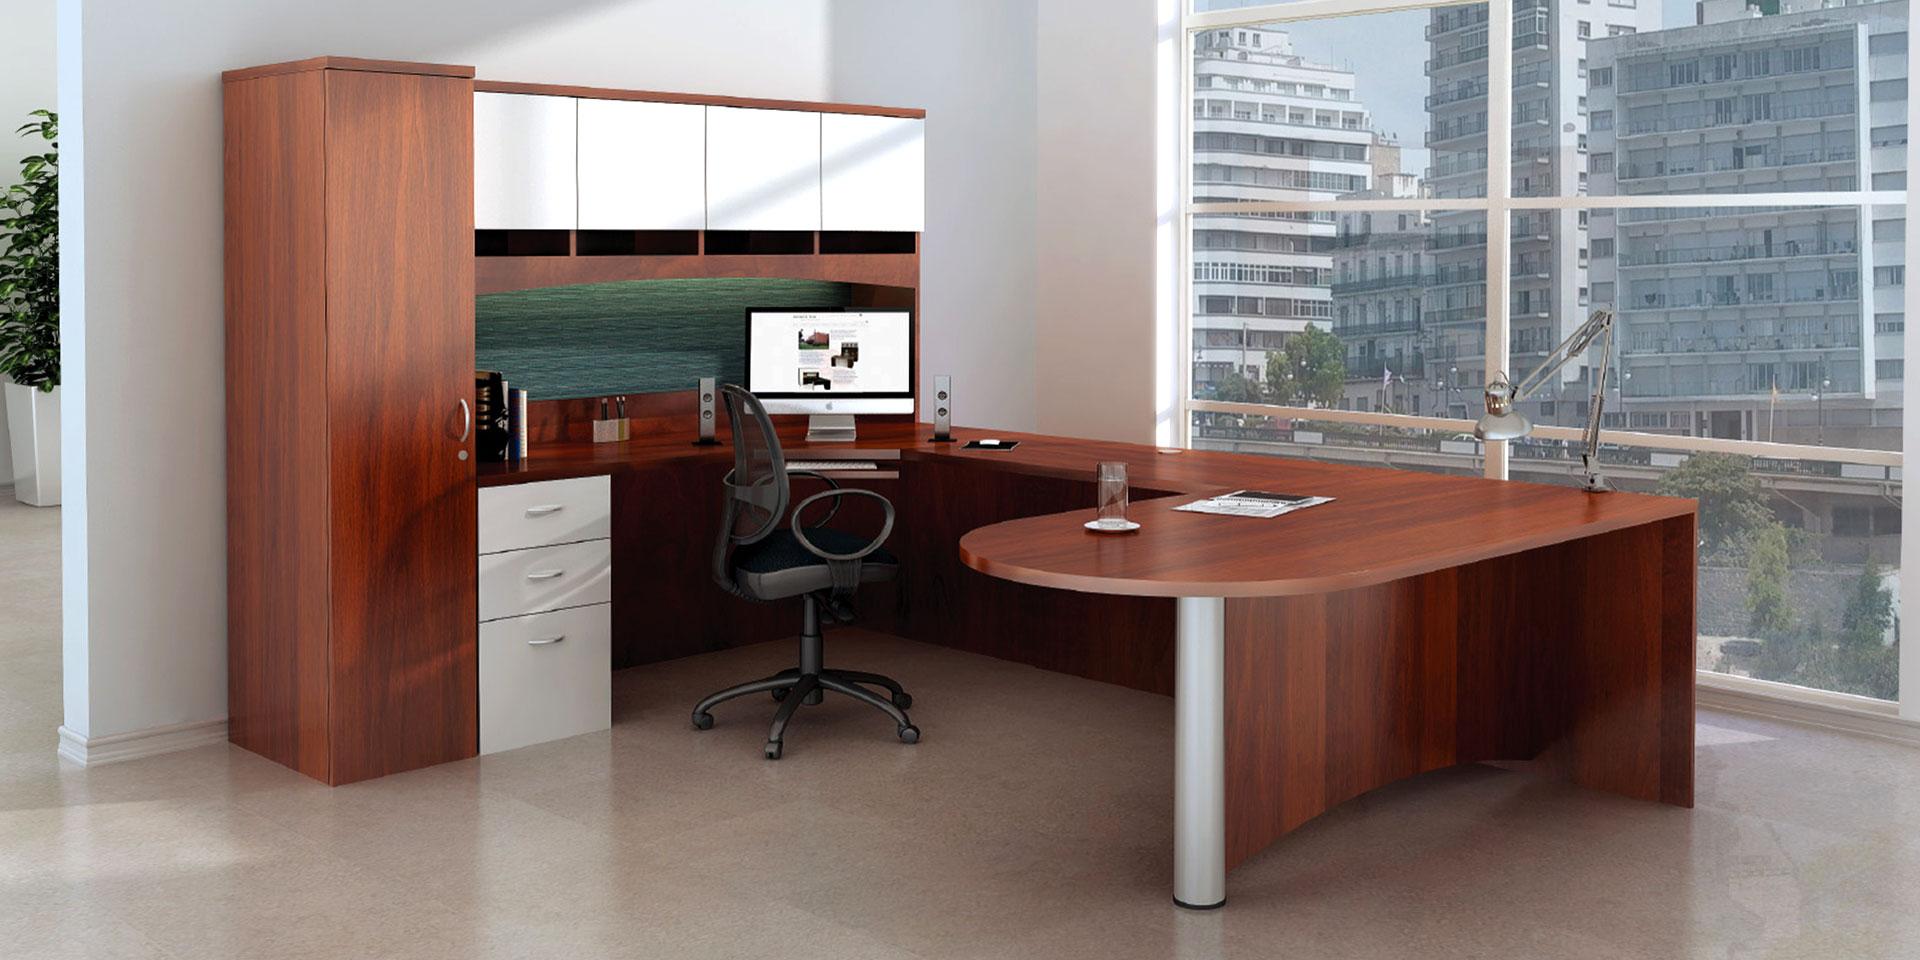 Phenomenal Maverick Desk Office Furniture Los Angeles Orange County Download Free Architecture Designs Scobabritishbridgeorg